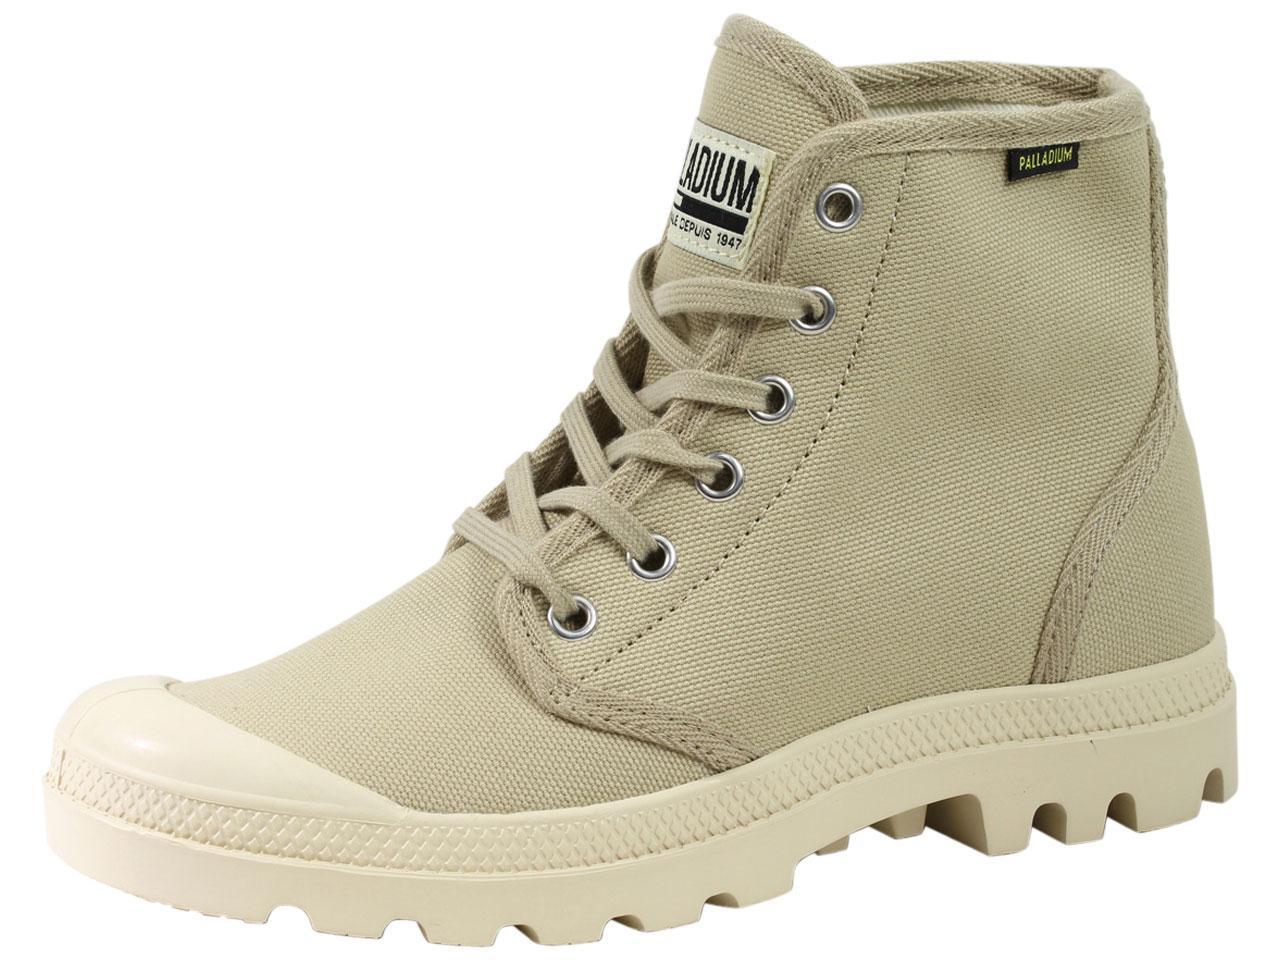 Image of Palladium Men's Pampa Hi Originale Chukka Boots Shoes - Beige - 8 D(M) US/9.5 B(M) US